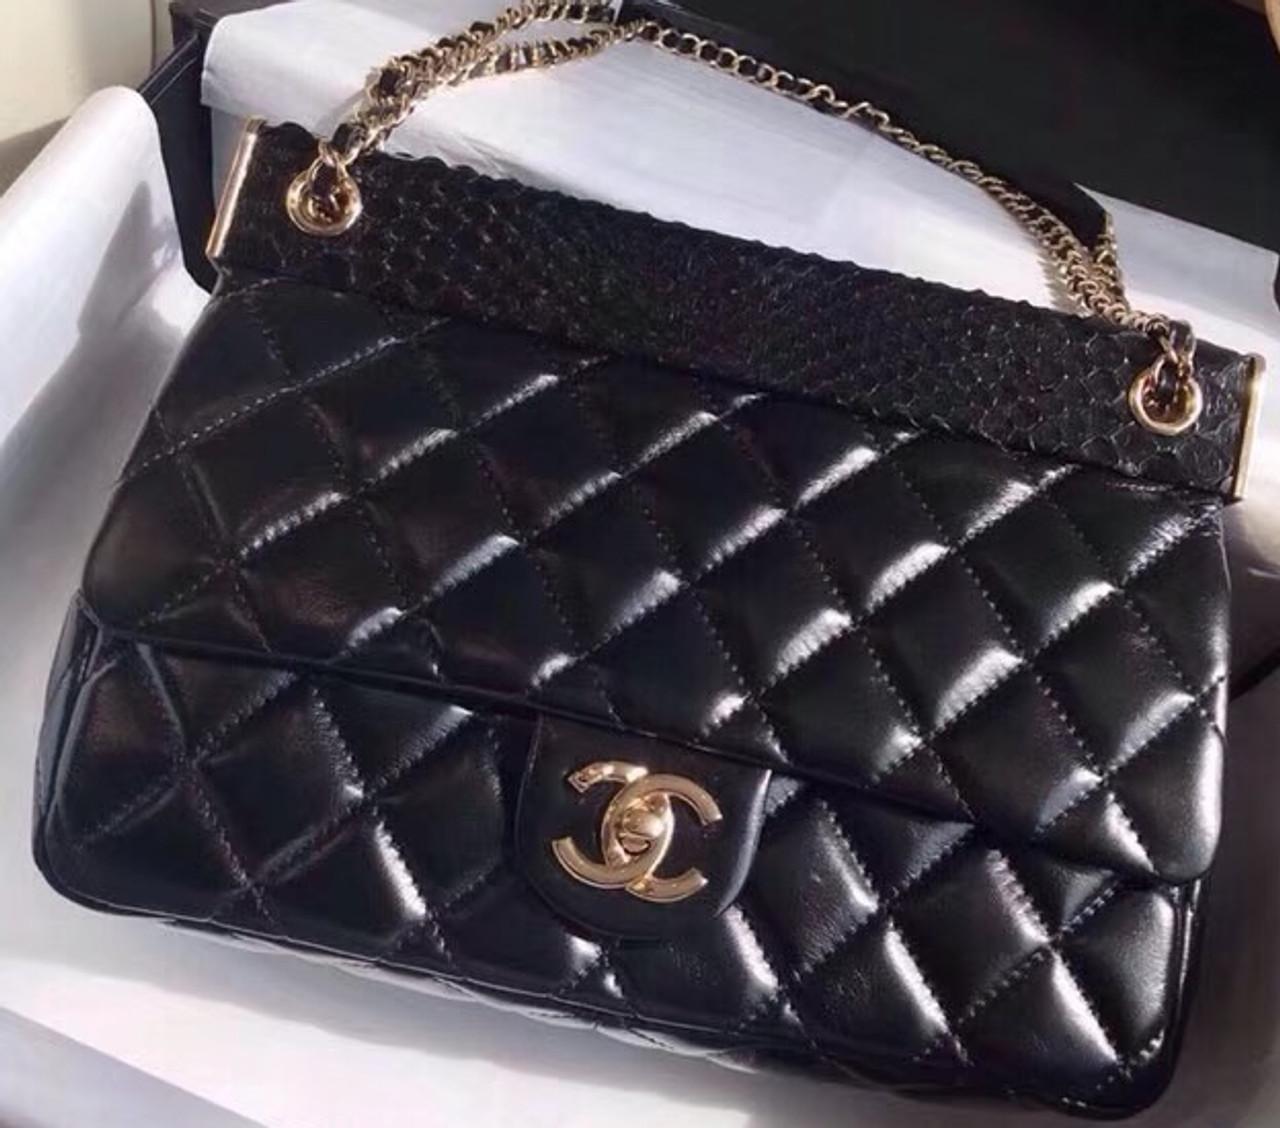 b3e6d69b323b Chanel Flap Bag A57047 - Bella Vita Moda